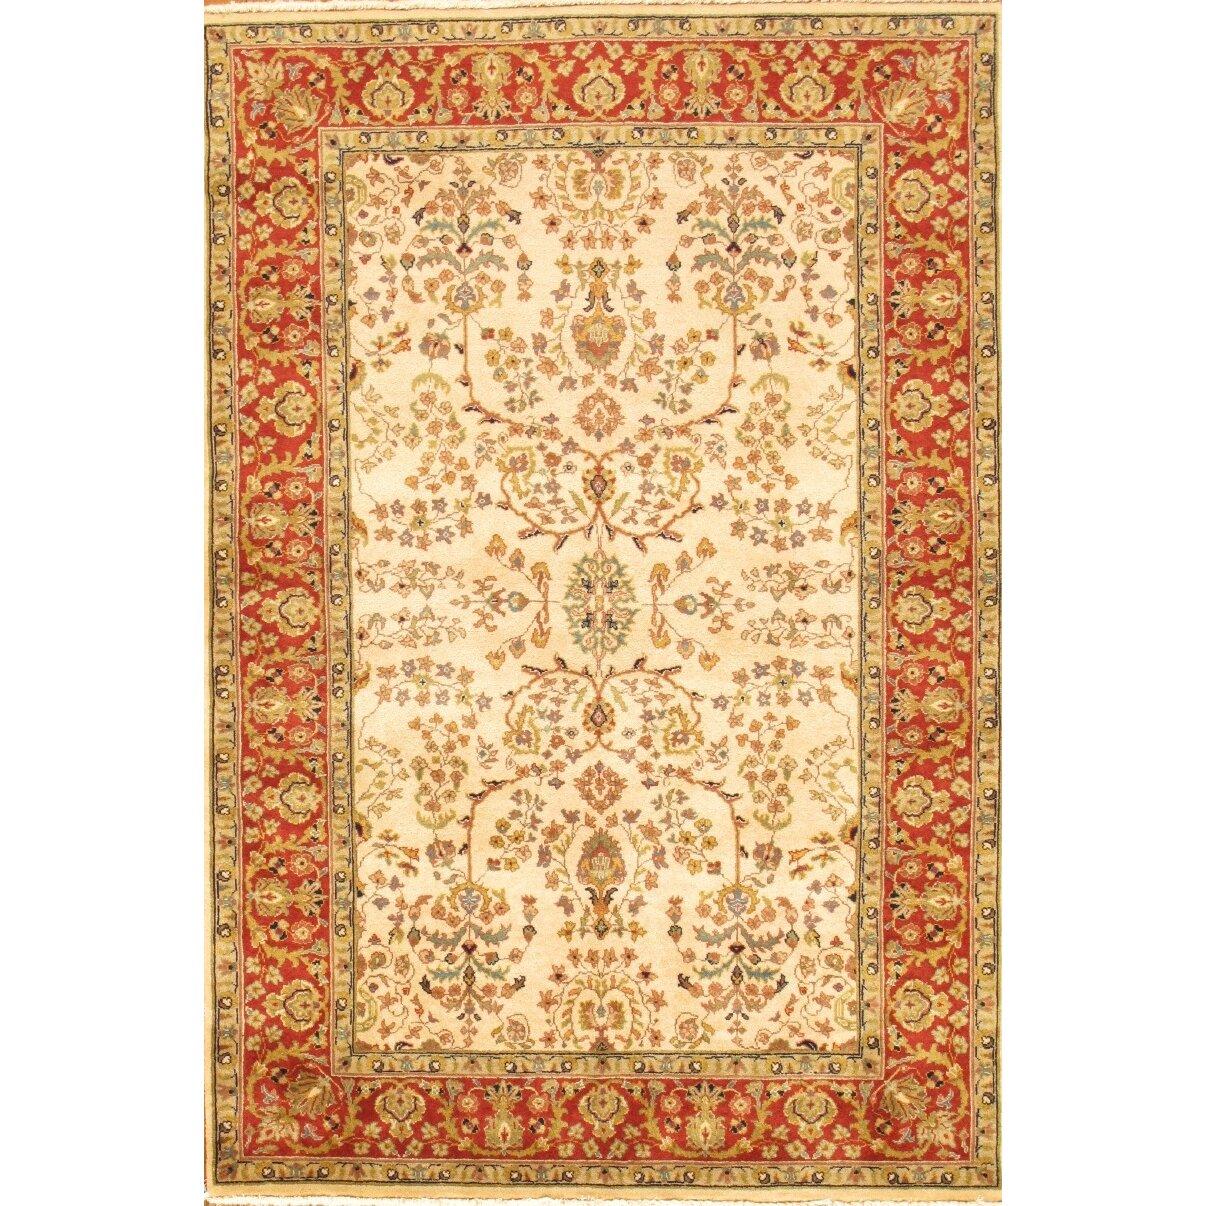 Sarouk Rust/Cream Traditional Persian Style Wool Area Rug